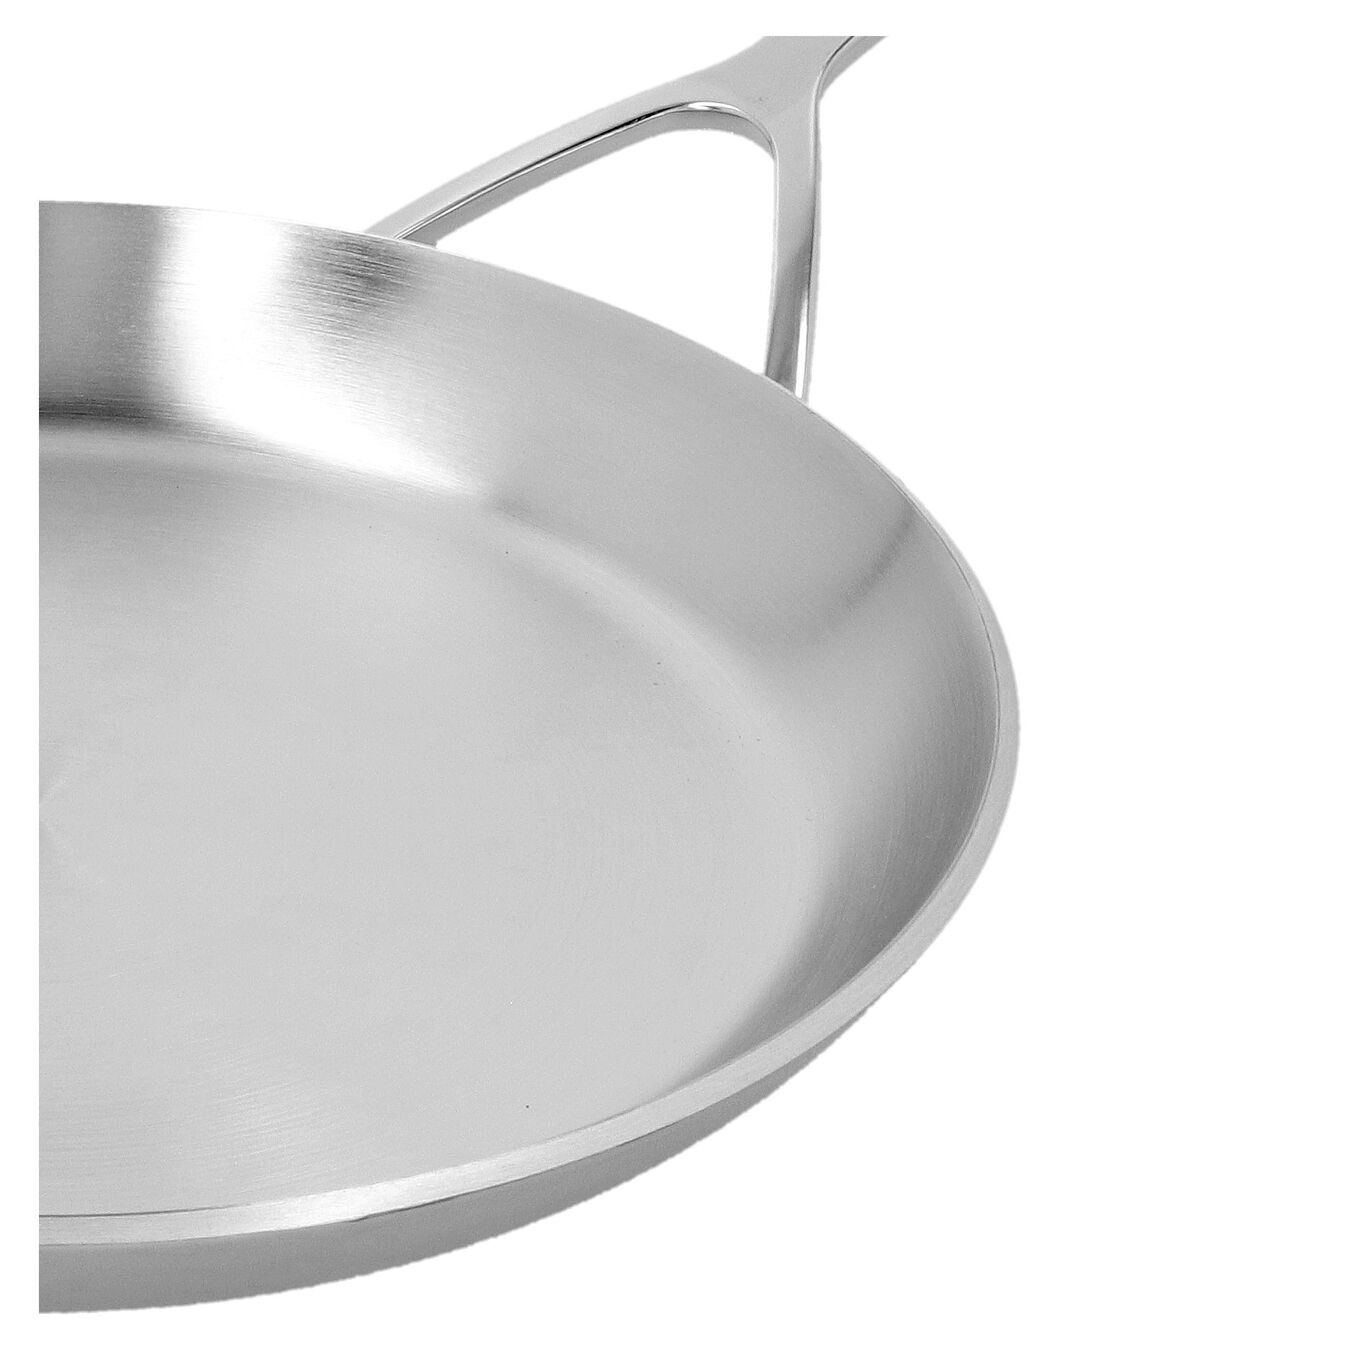 Pannenkoekenpan 26 cm,,large 2